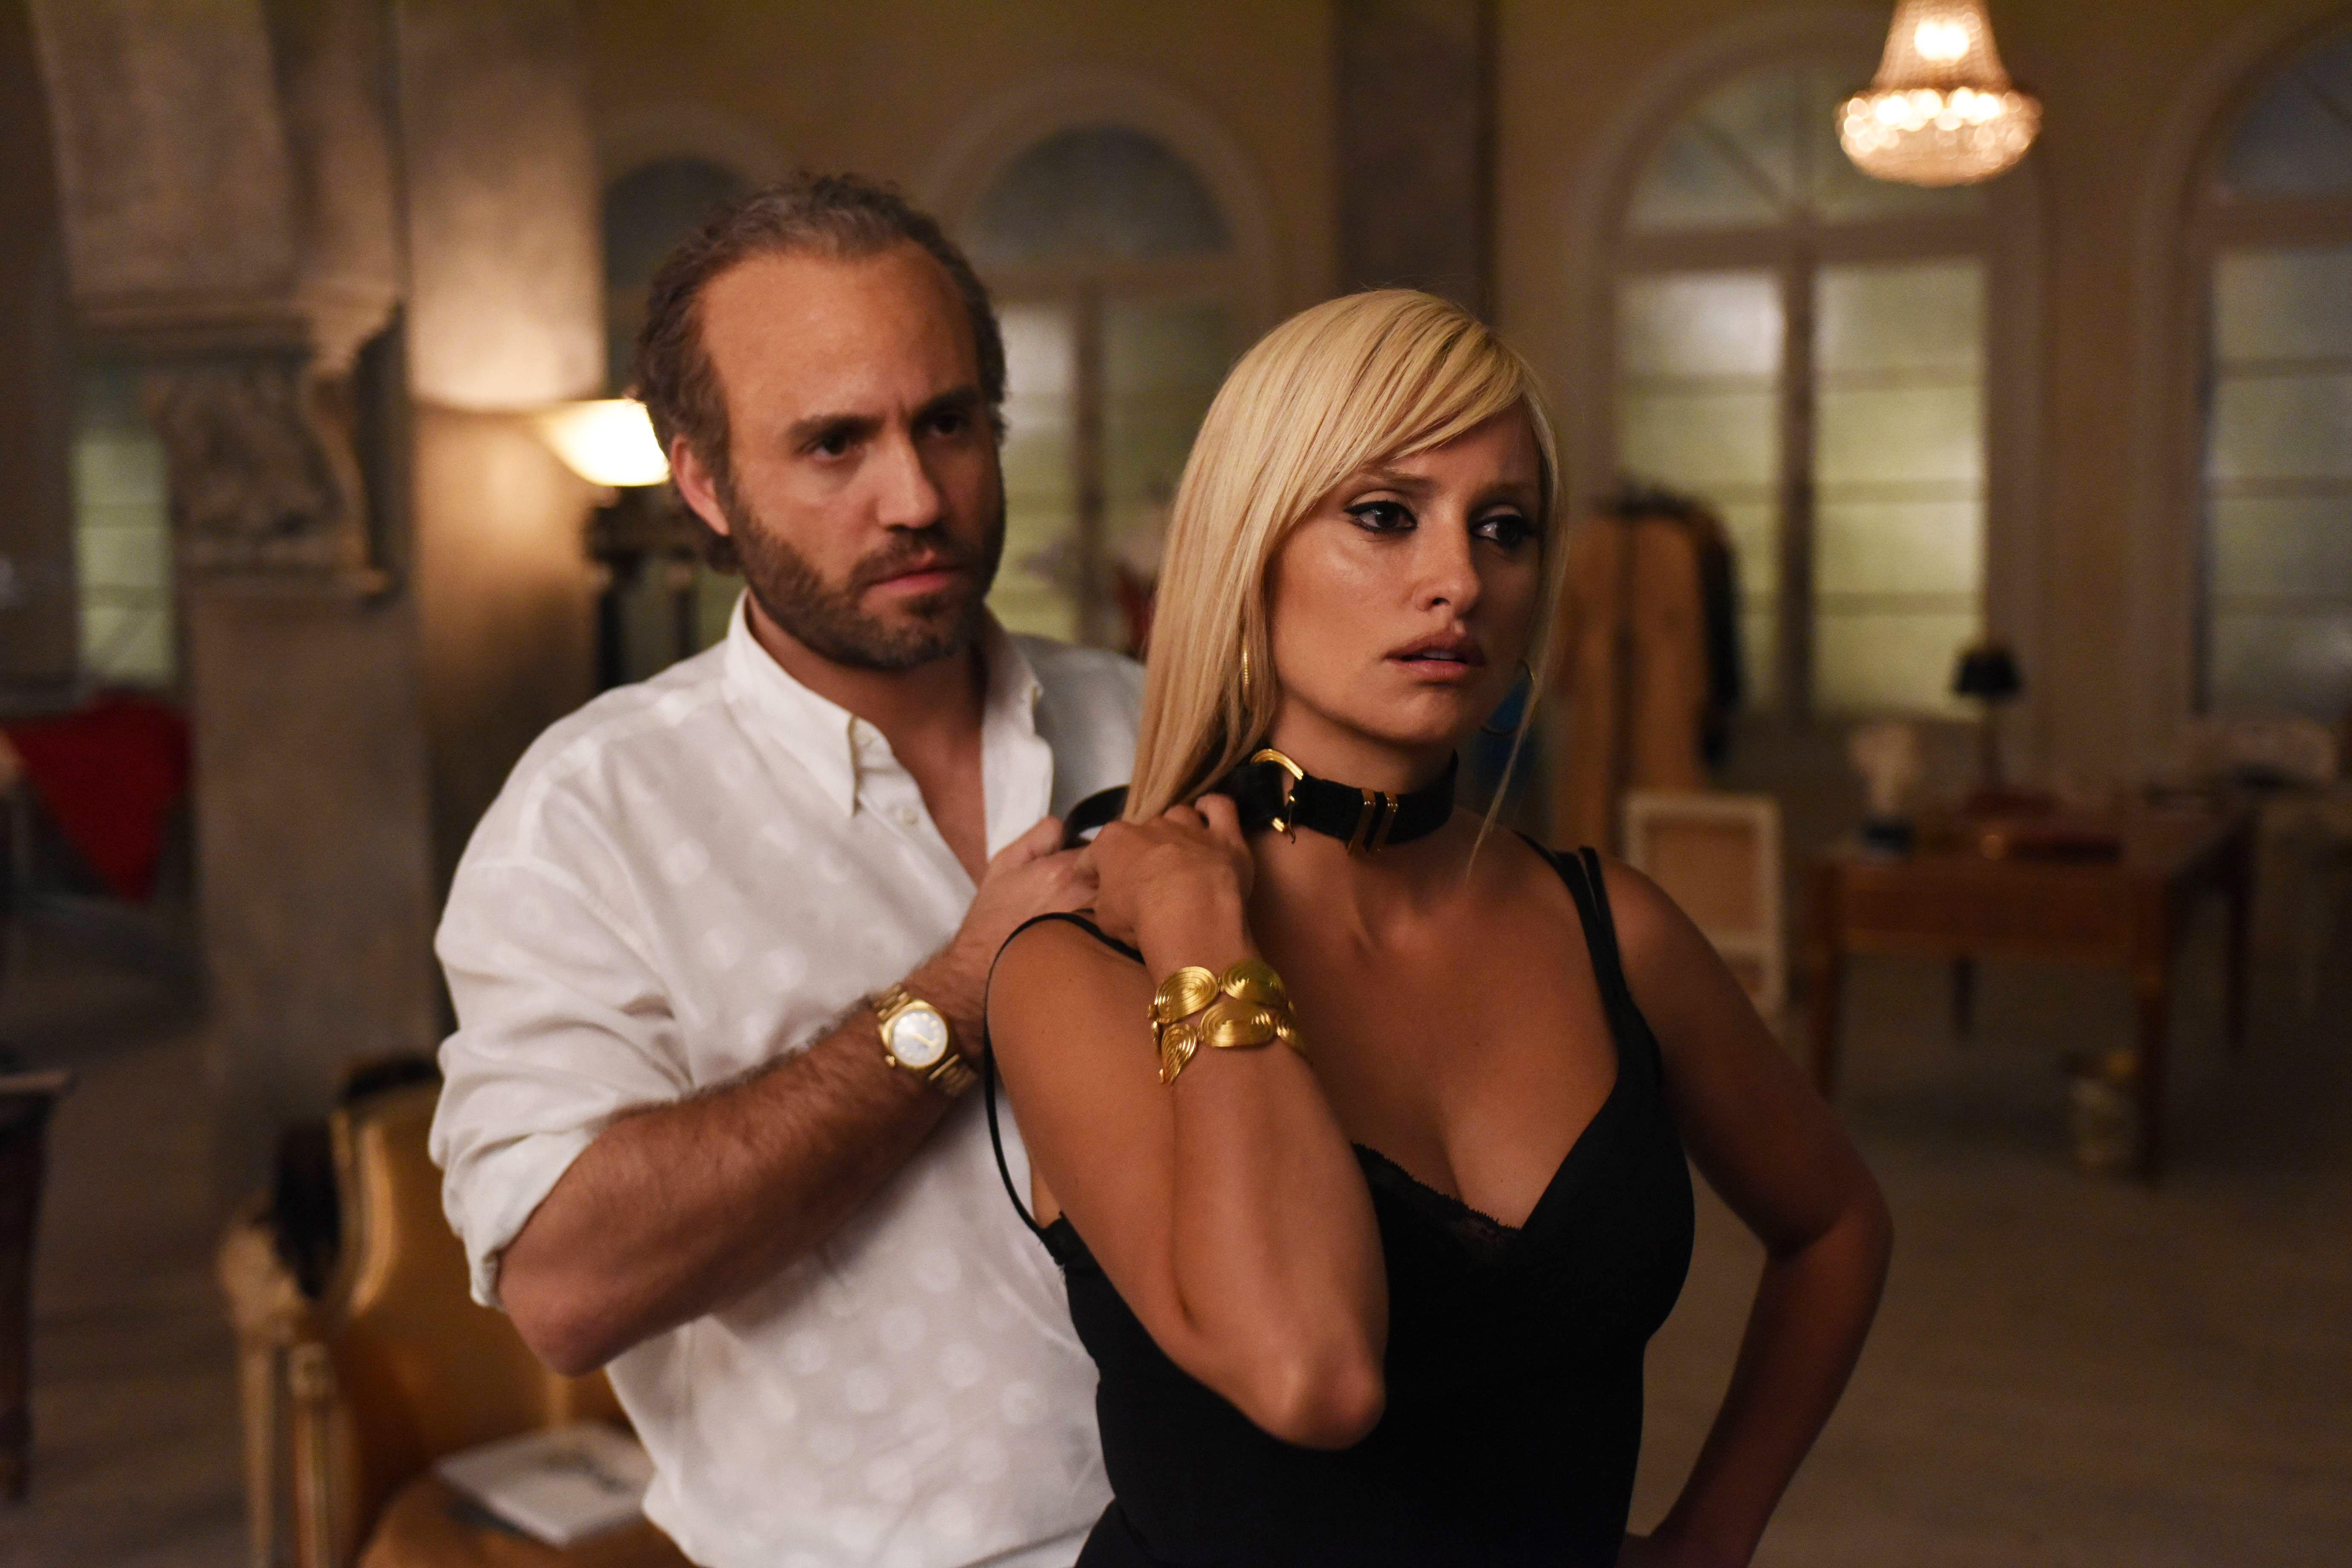 2bba4a9e0fc The Assassination of Gianni Versace Episode 7 Spotlights Penelope Cruz s  Donatella